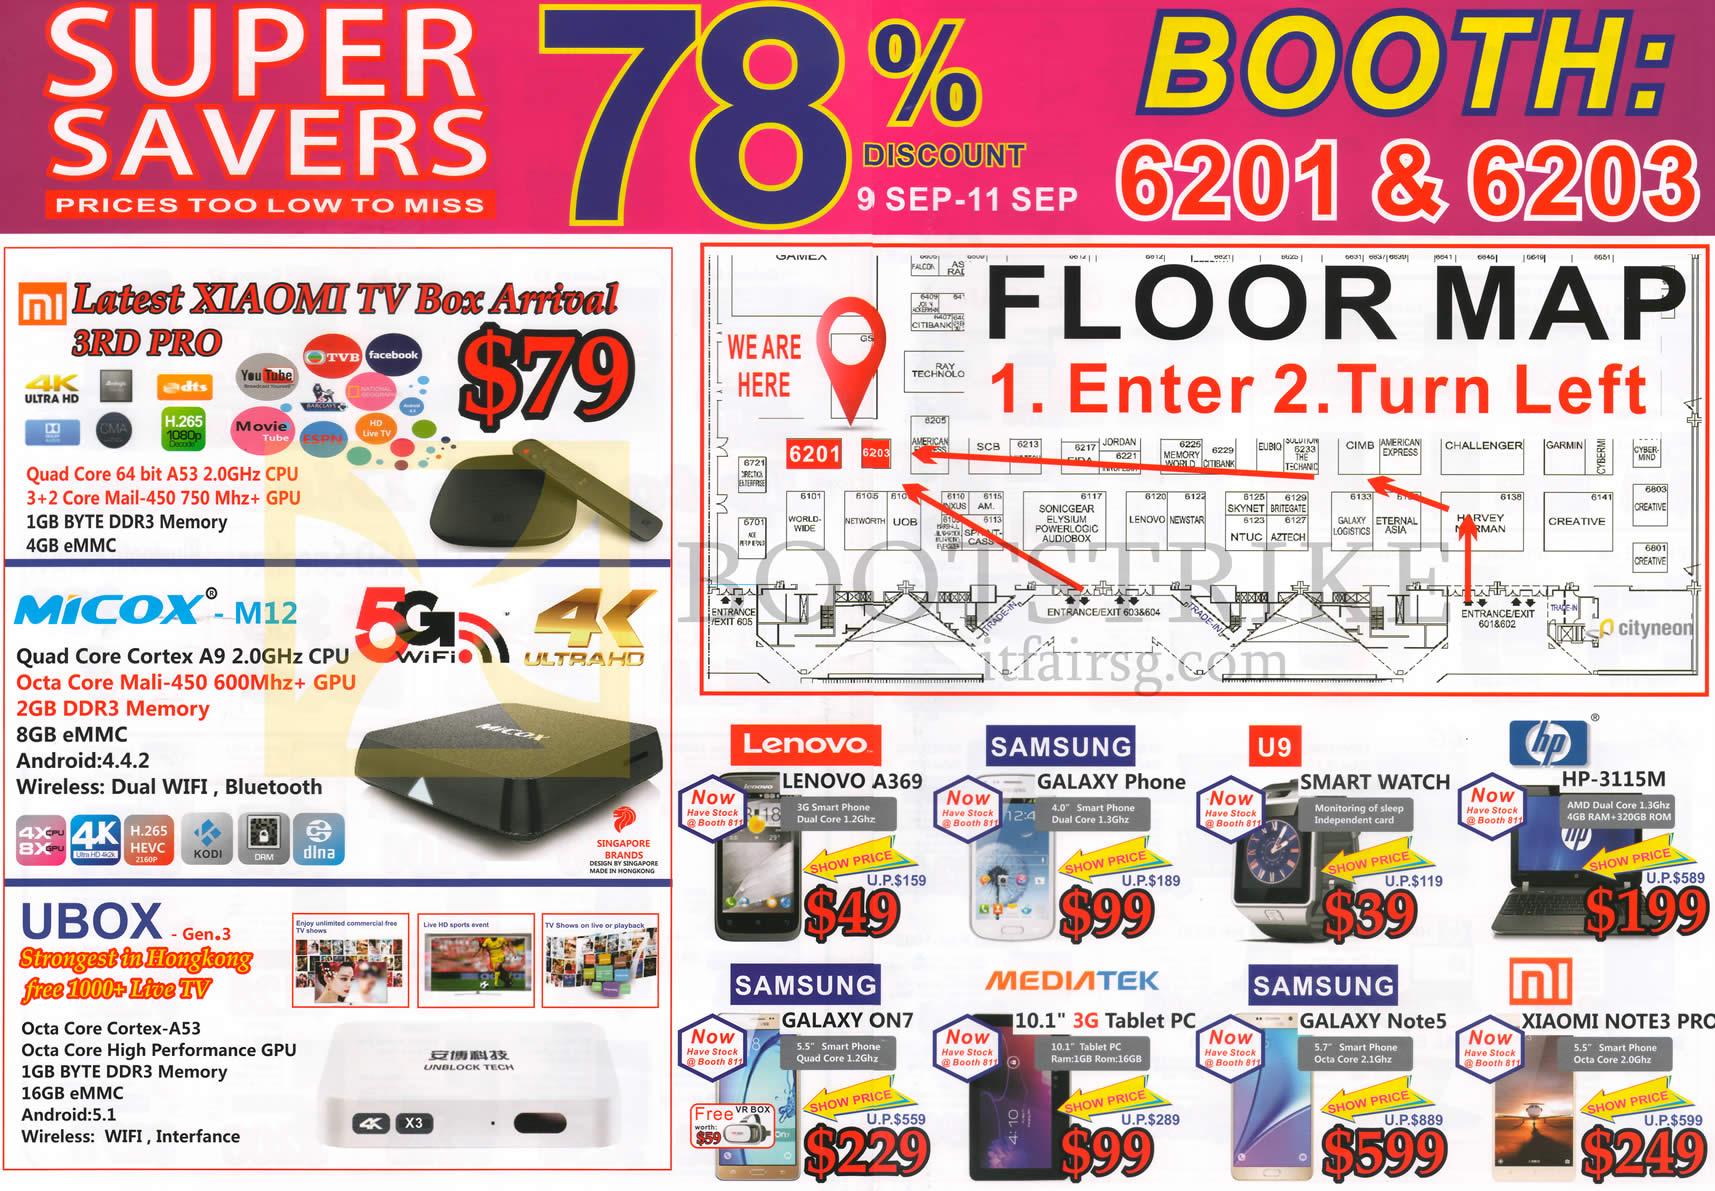 J2 TV Box, Memory, Live TV, Mobile Phones, Tablets, Smart